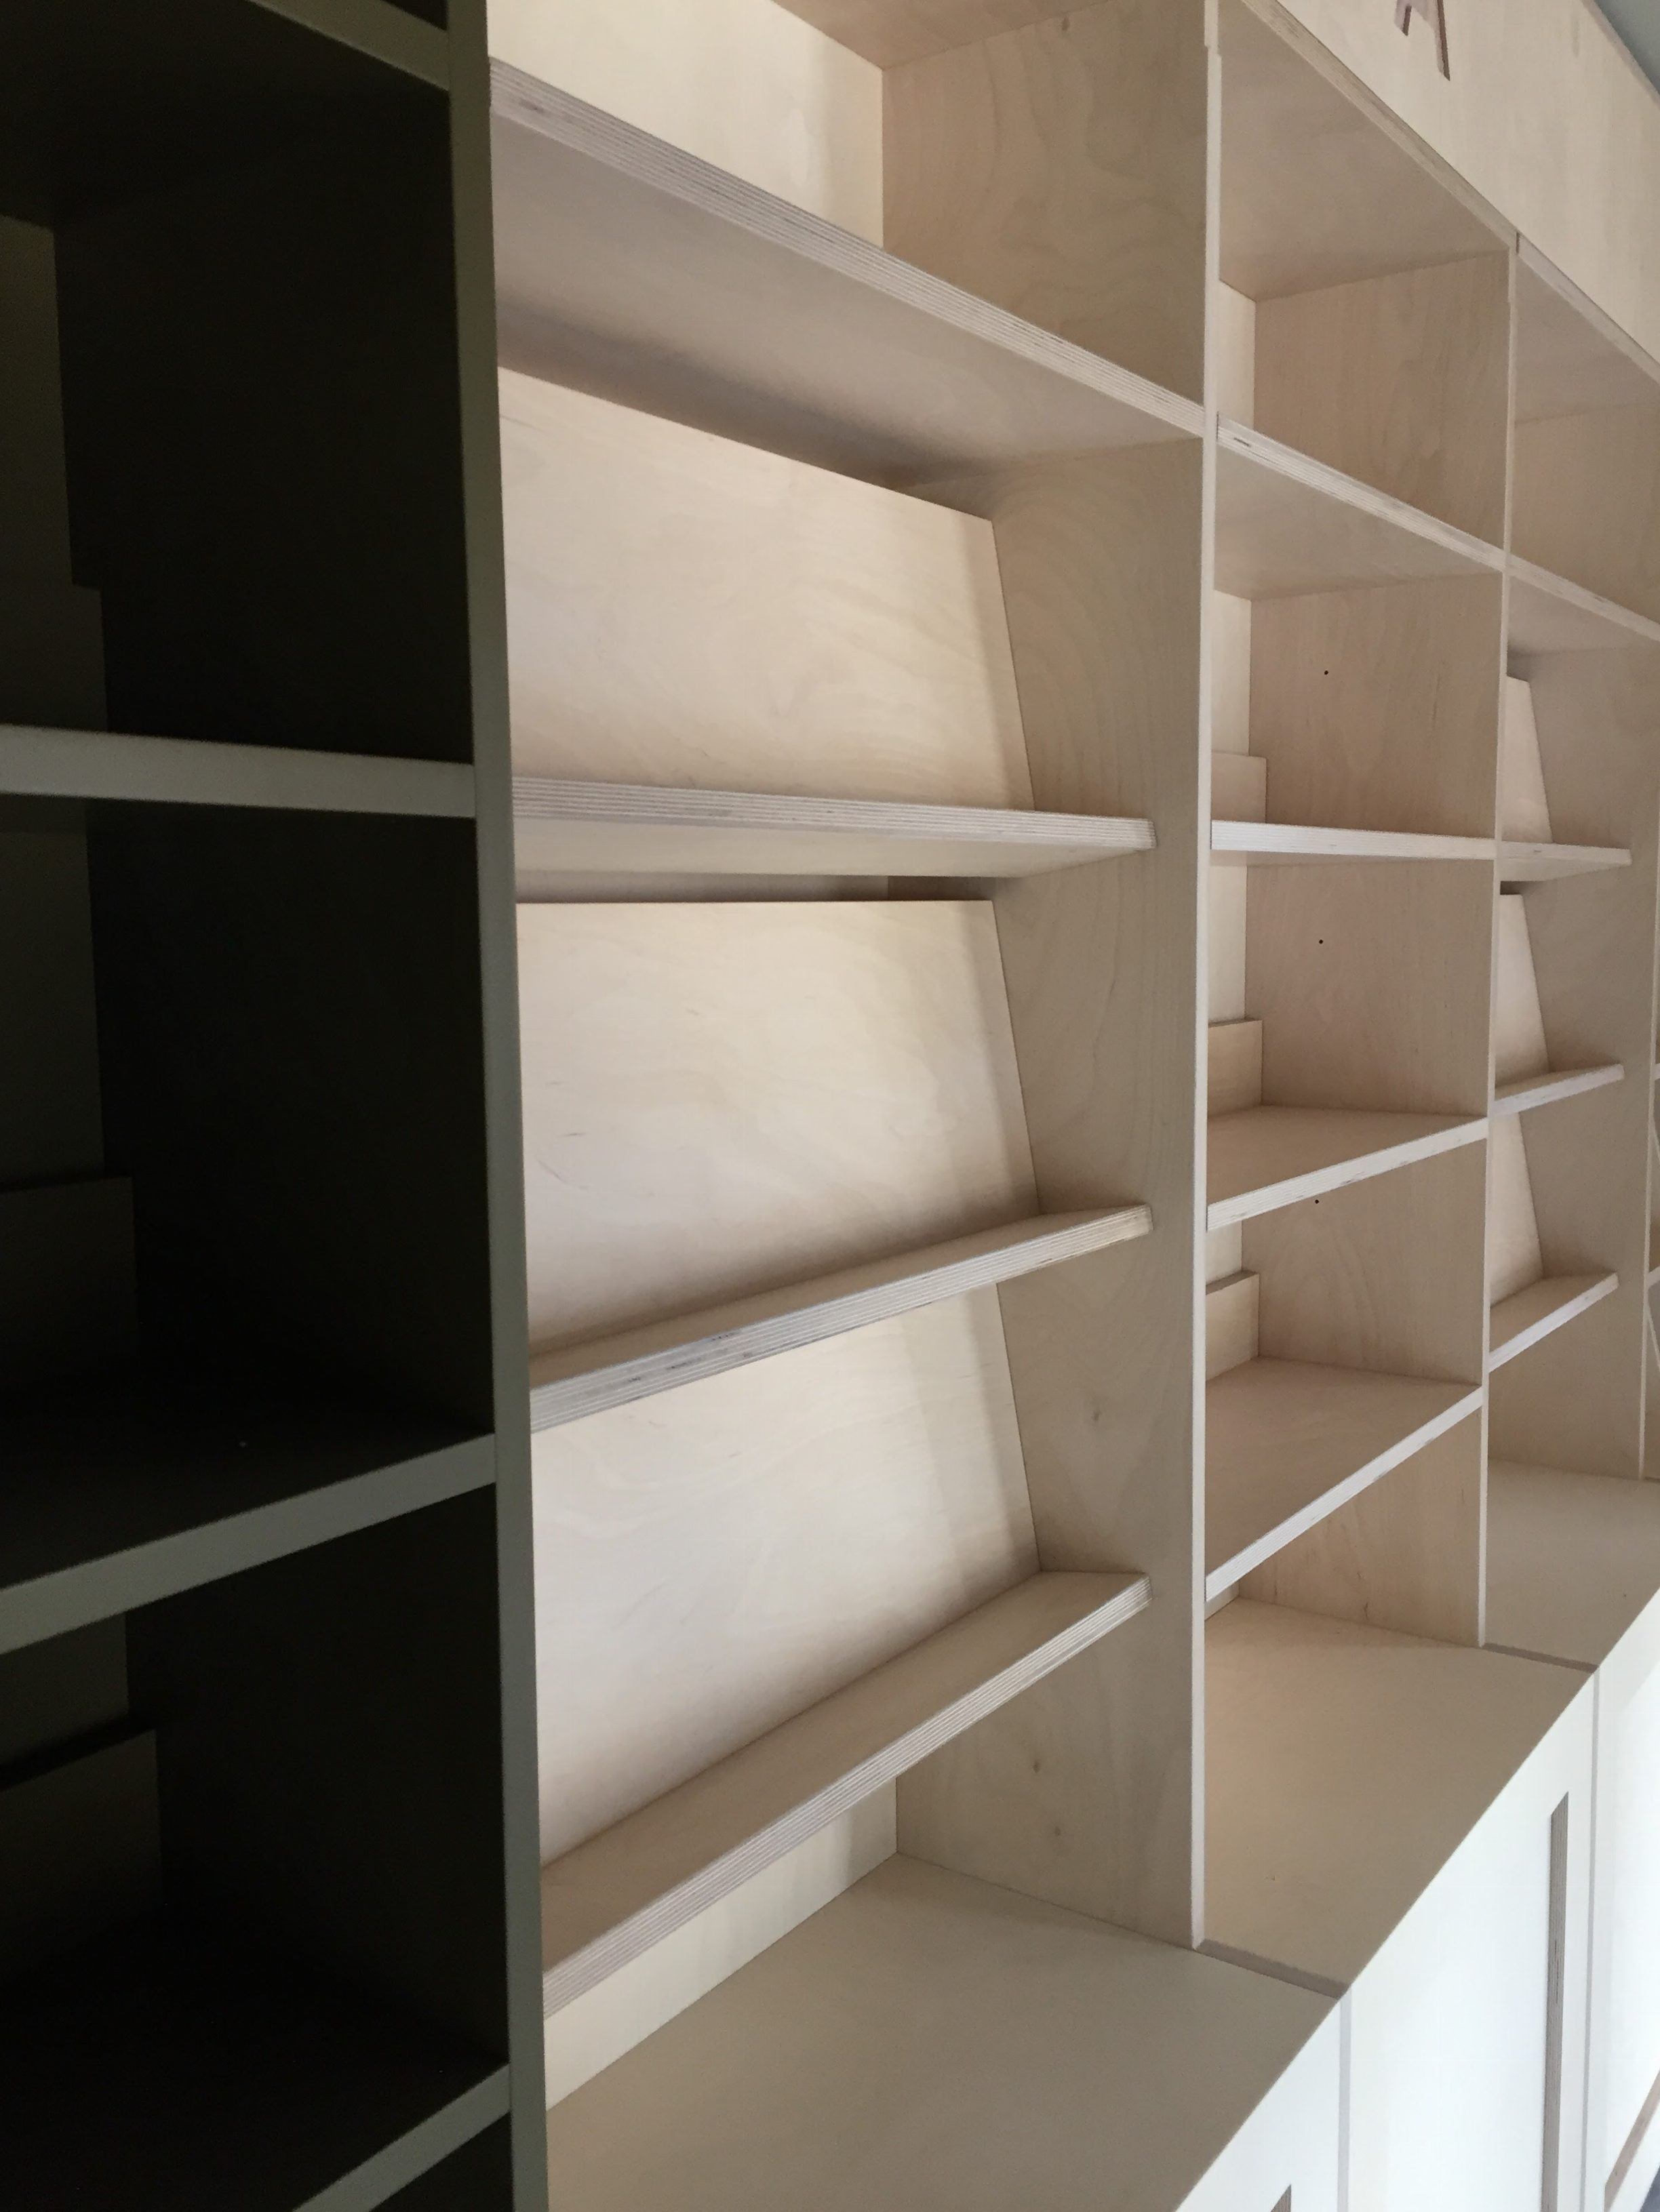 kasten stijlkamer e1466859267674 - Bibliotheek Ligne Sittard